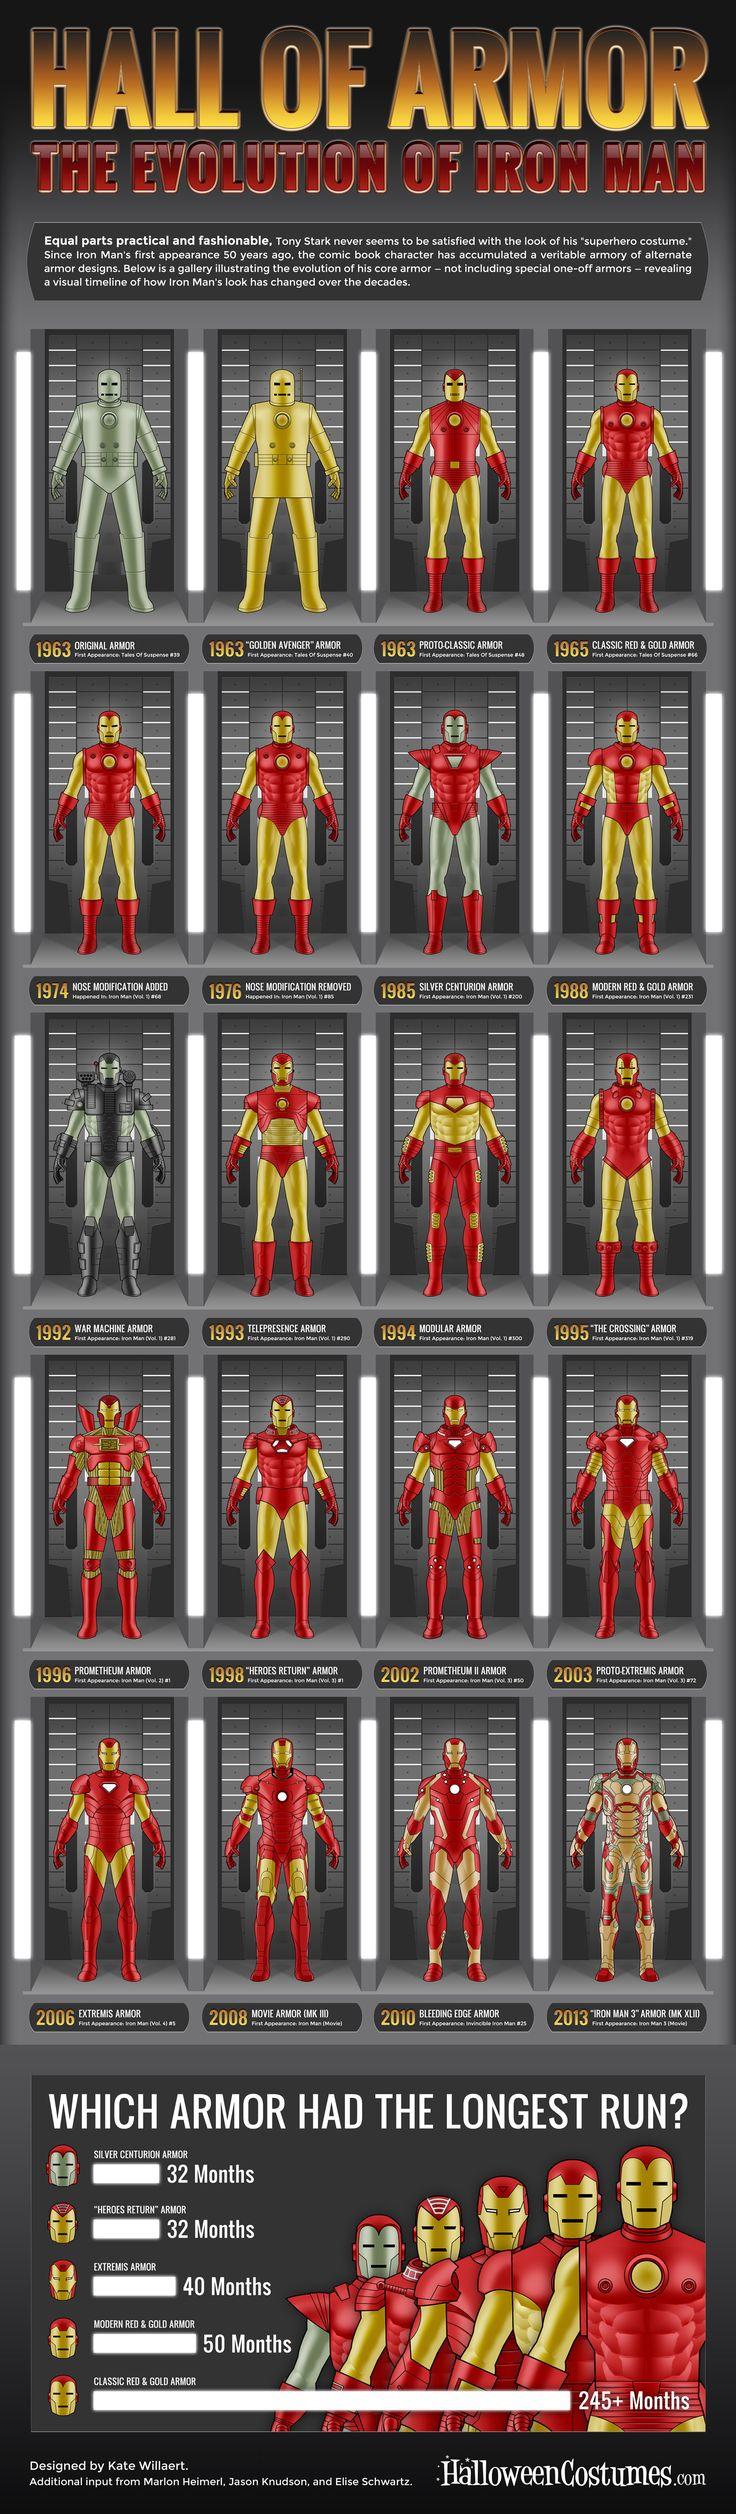 Hall of Armor: The Evolution of Iron Man [Infographic] - Halloween Costumes Blog